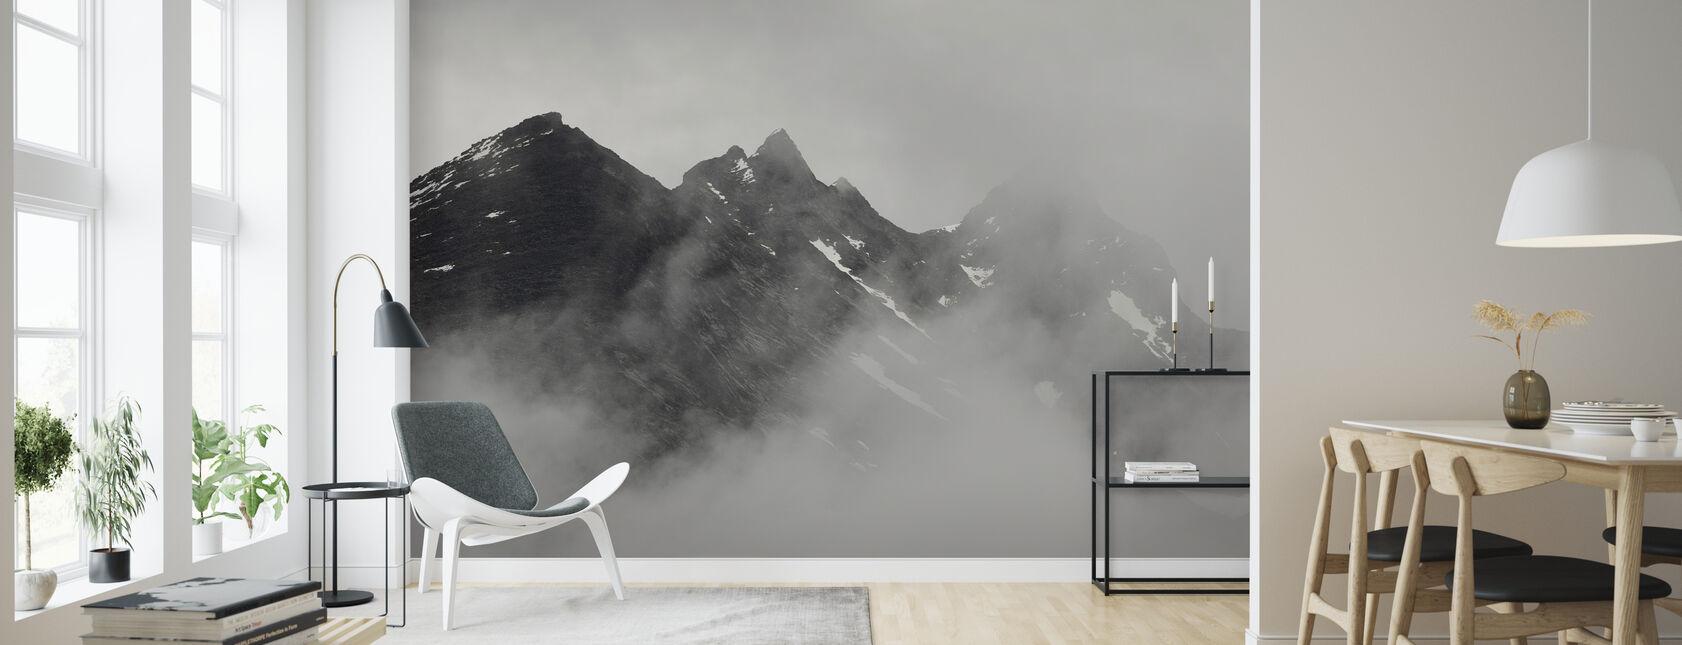 Vettisfossen Bjerge, Norge - Tapet - Stue